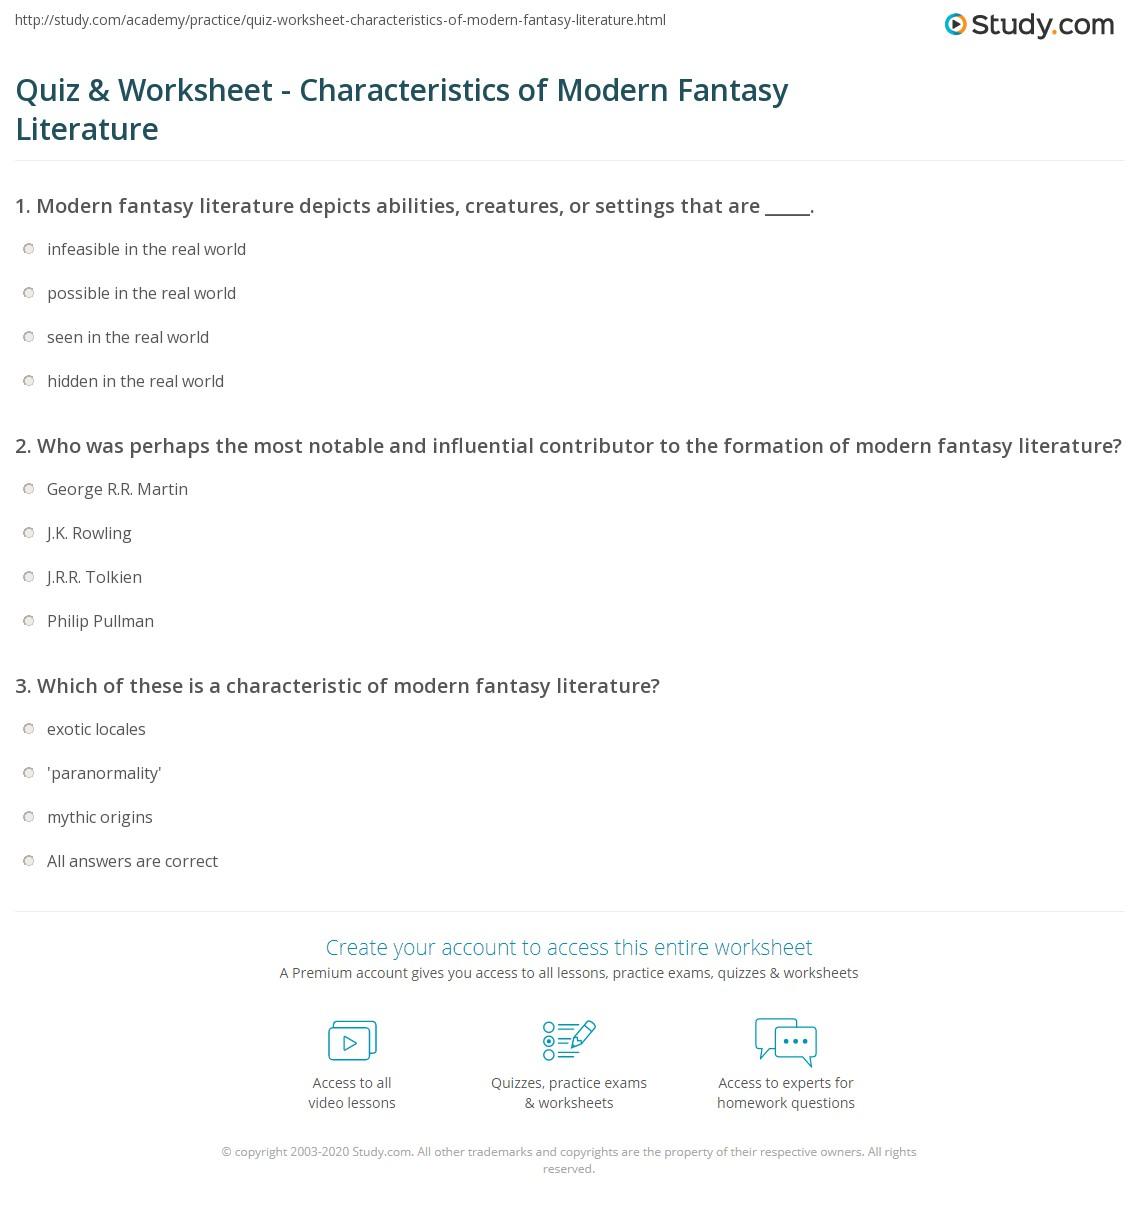 hight resolution of Quiz \u0026 Worksheet - Characteristics of Modern Fantasy Literature   Study.com